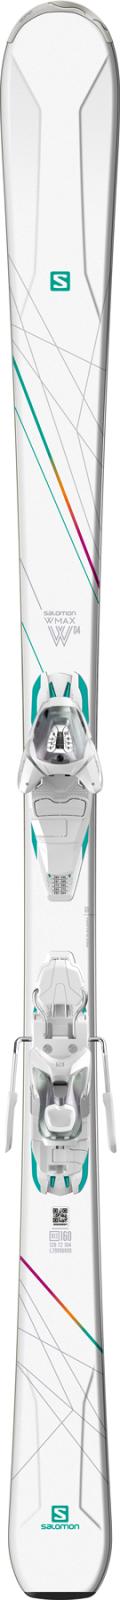 Salomon W-Max 4 + Lithium 10 W